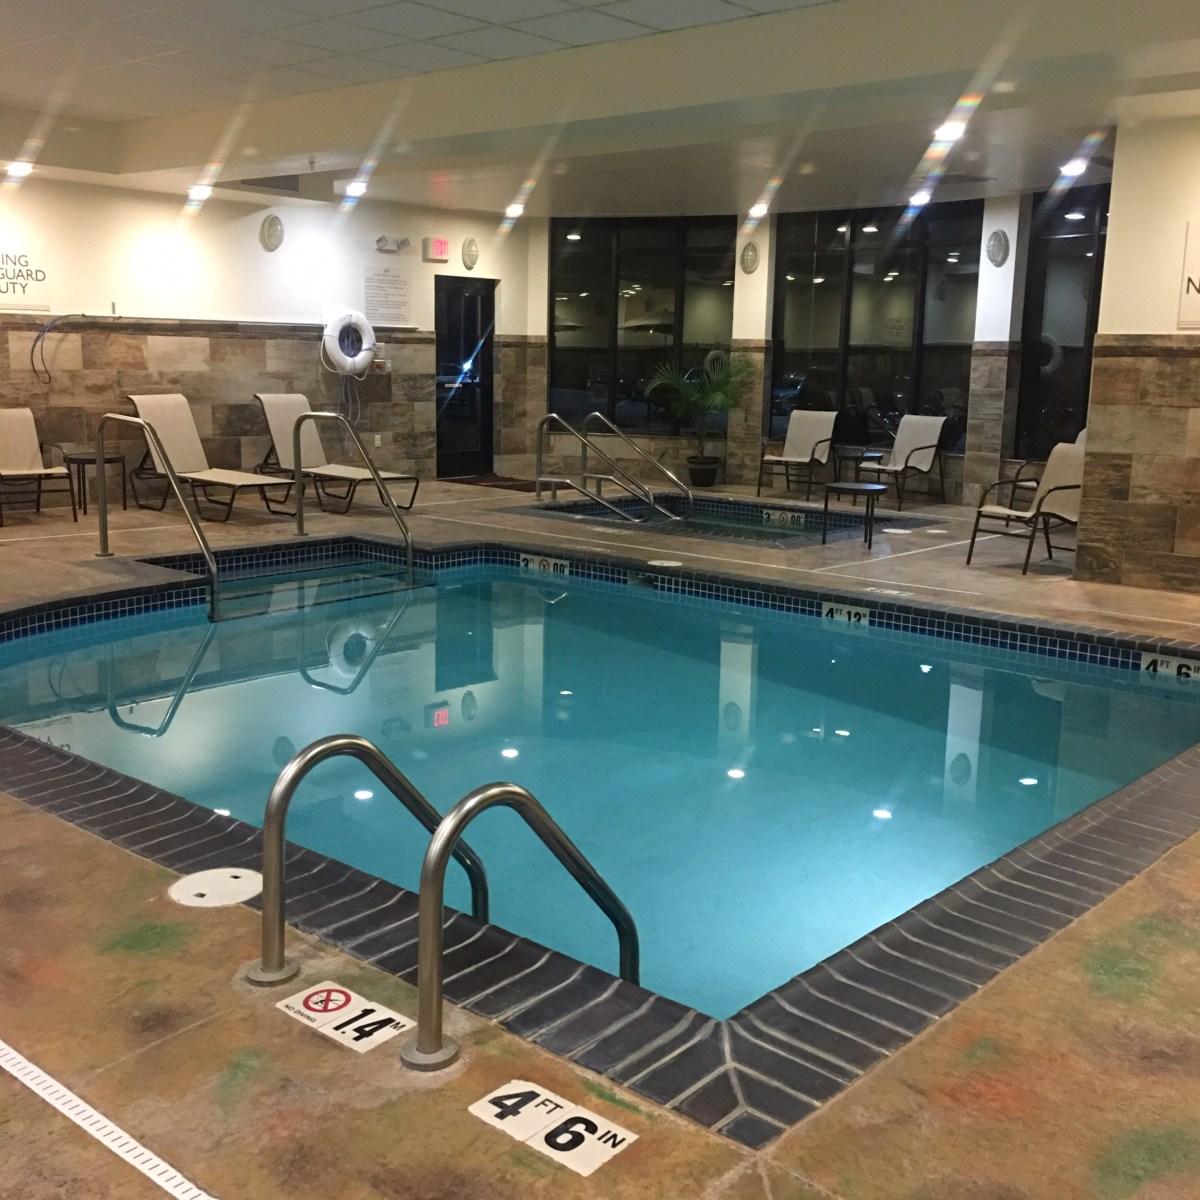 Hilton Garden Inn Pool and Hot Tub